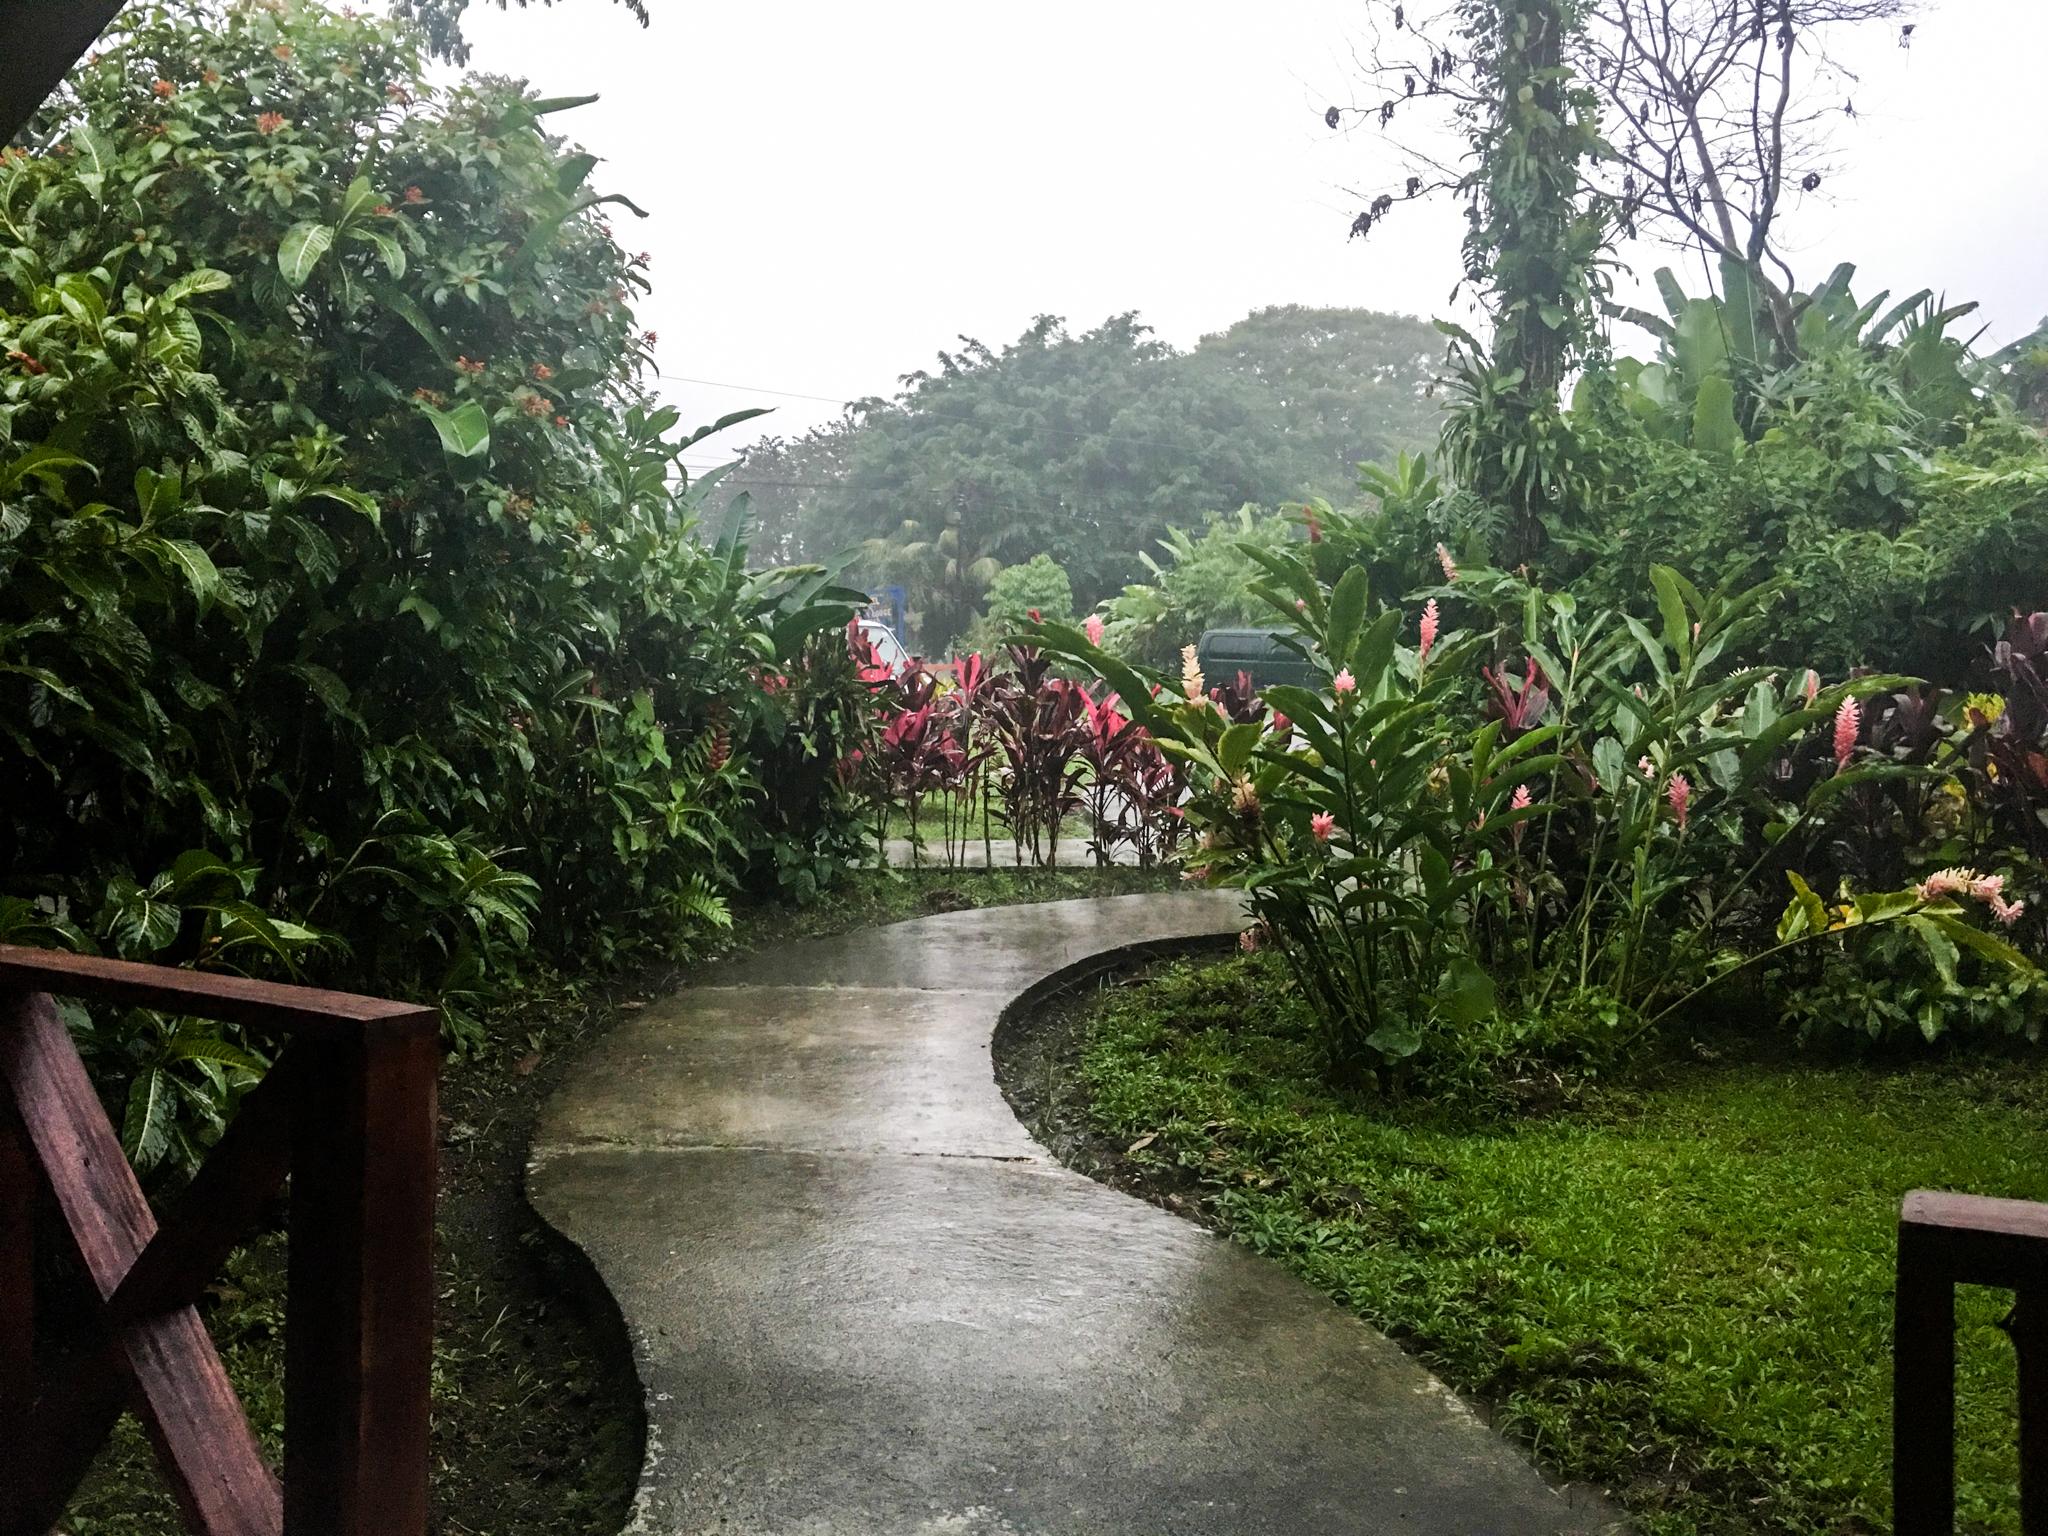 It didn't always rain. But often it did.